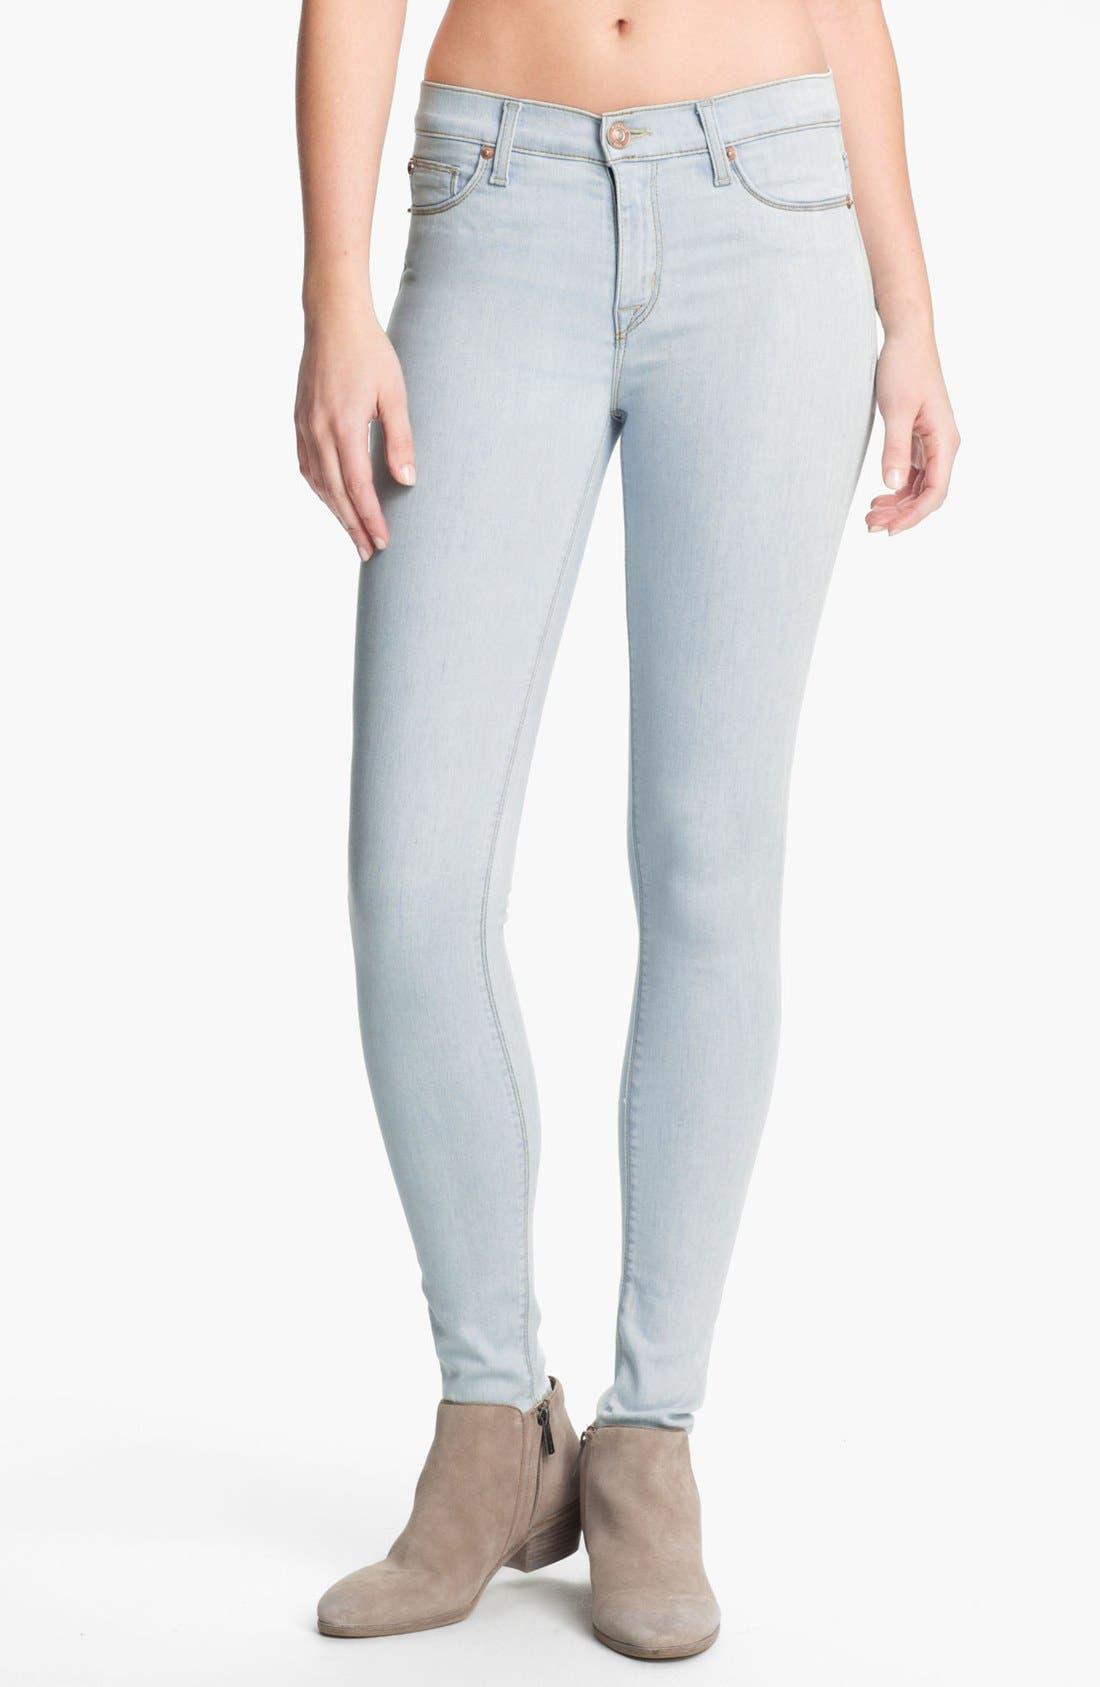 Main Image - Hudson Jeans 'Nico' Super Skinny Jeans (Dahlia)